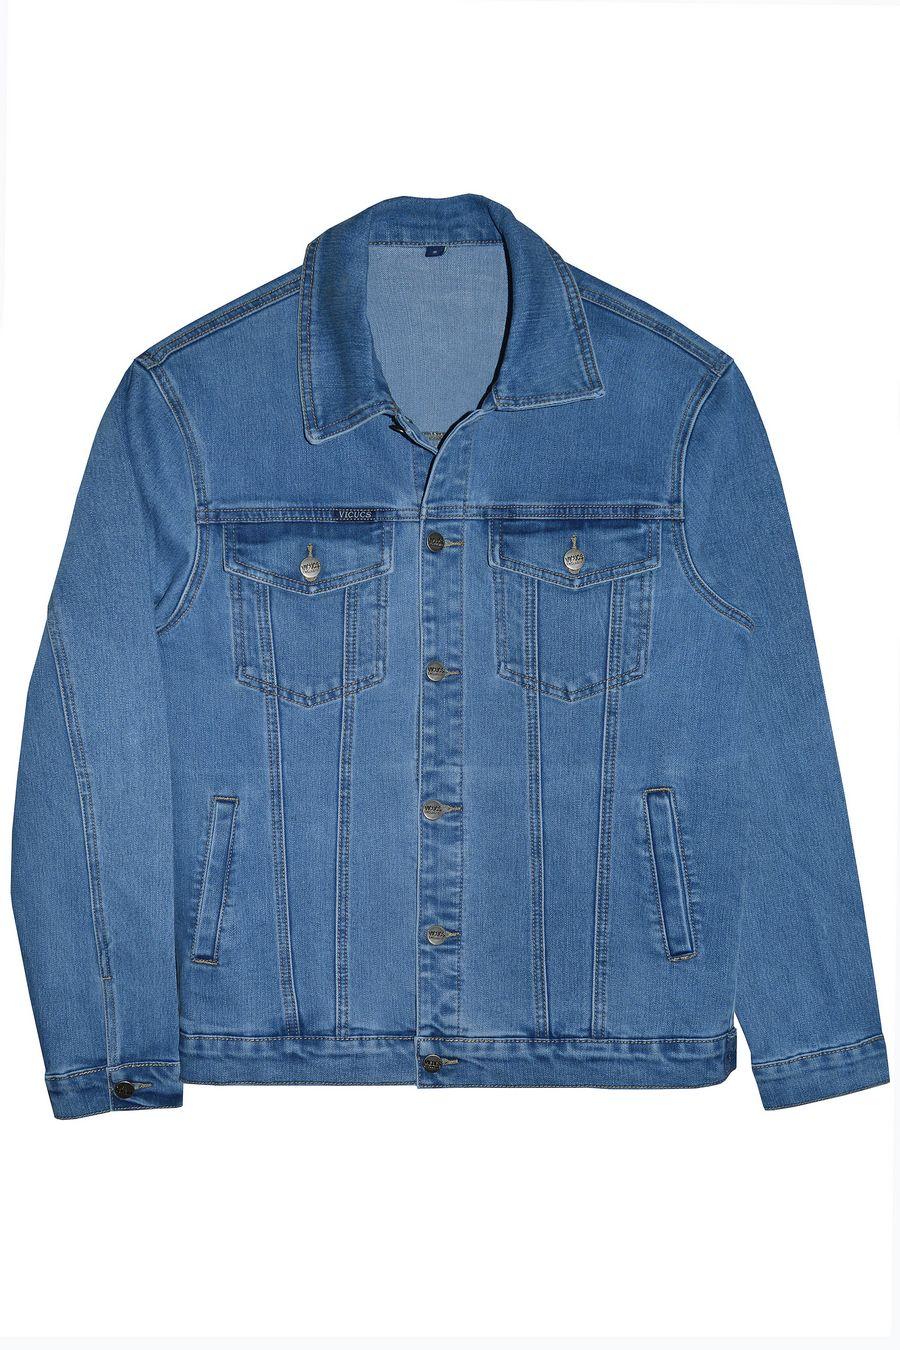 Пиджак мужской (джинсовка) Vicucs 728E.870-10-1 (XL-5XL) - фото 1